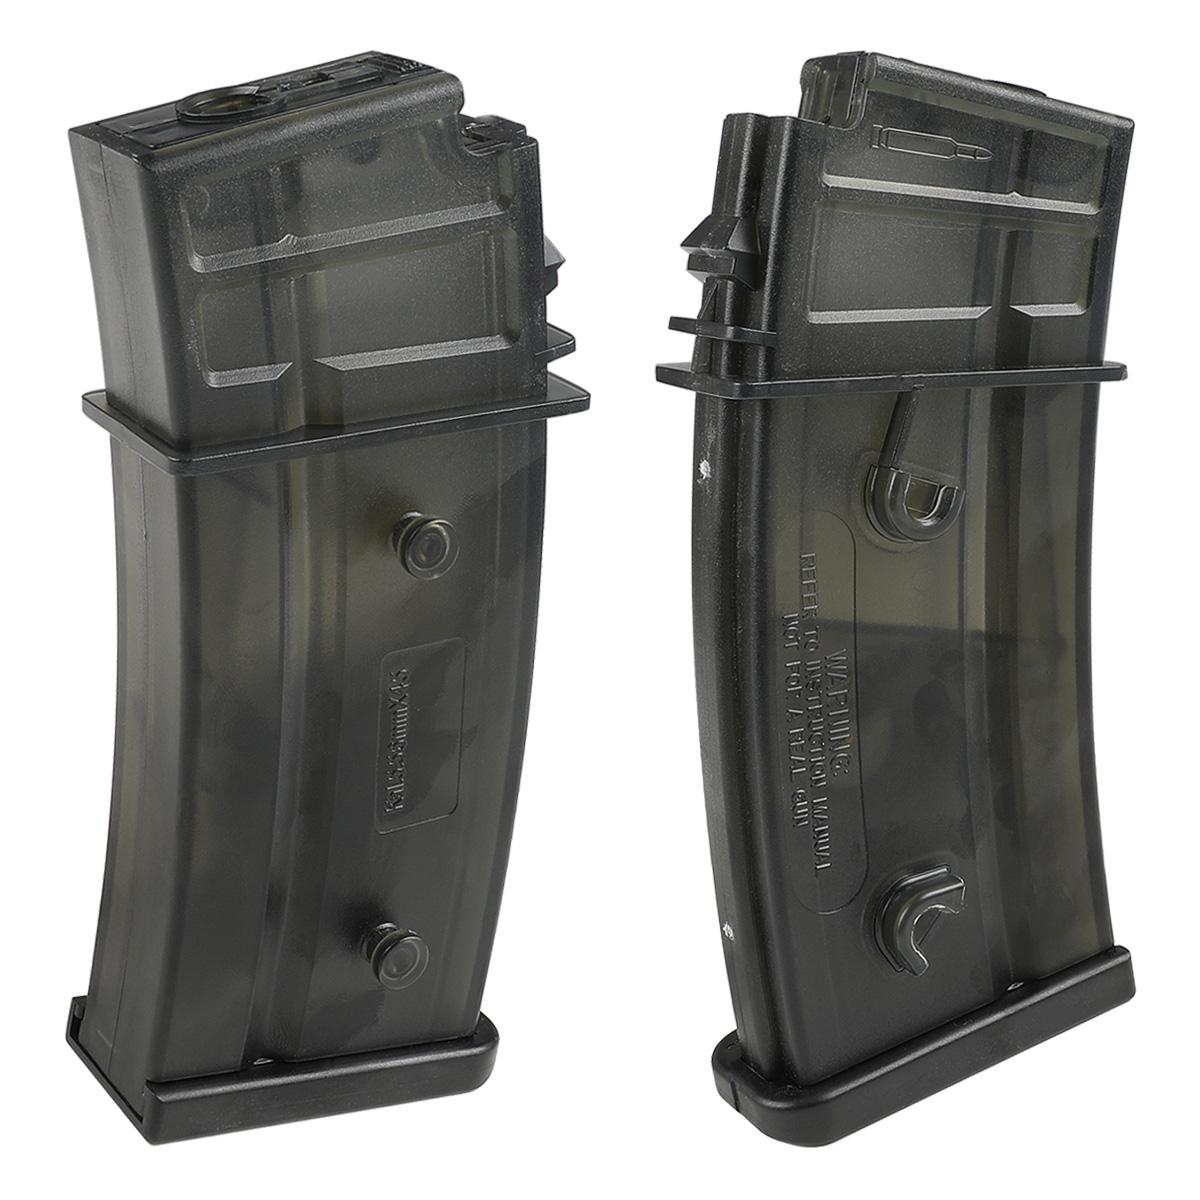 【同梱不可】 SRC H&K XM8-CX フルサイズ電動ガン NV Black (JP Ver.) 【配送業者:佐川急便限定】